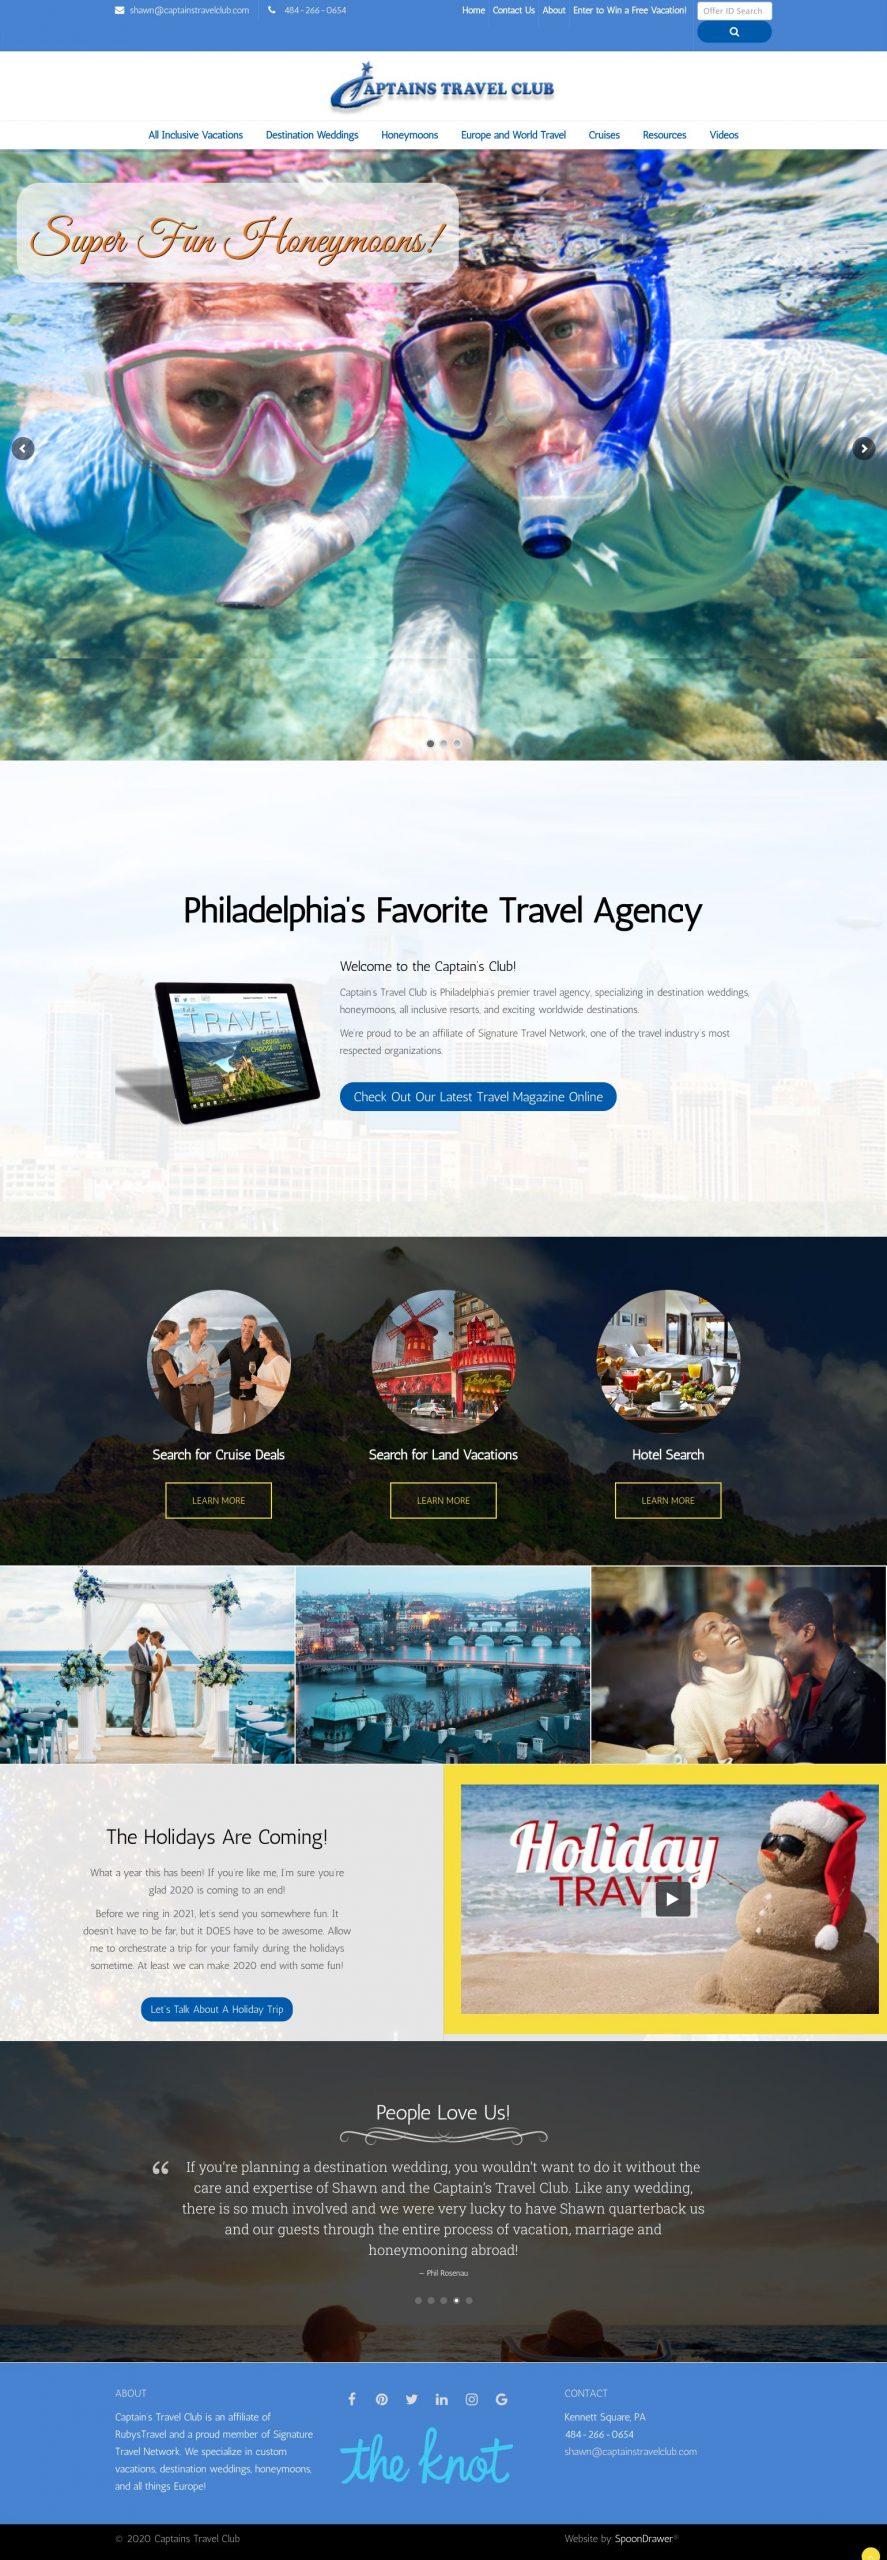 Customizing Your Homepage